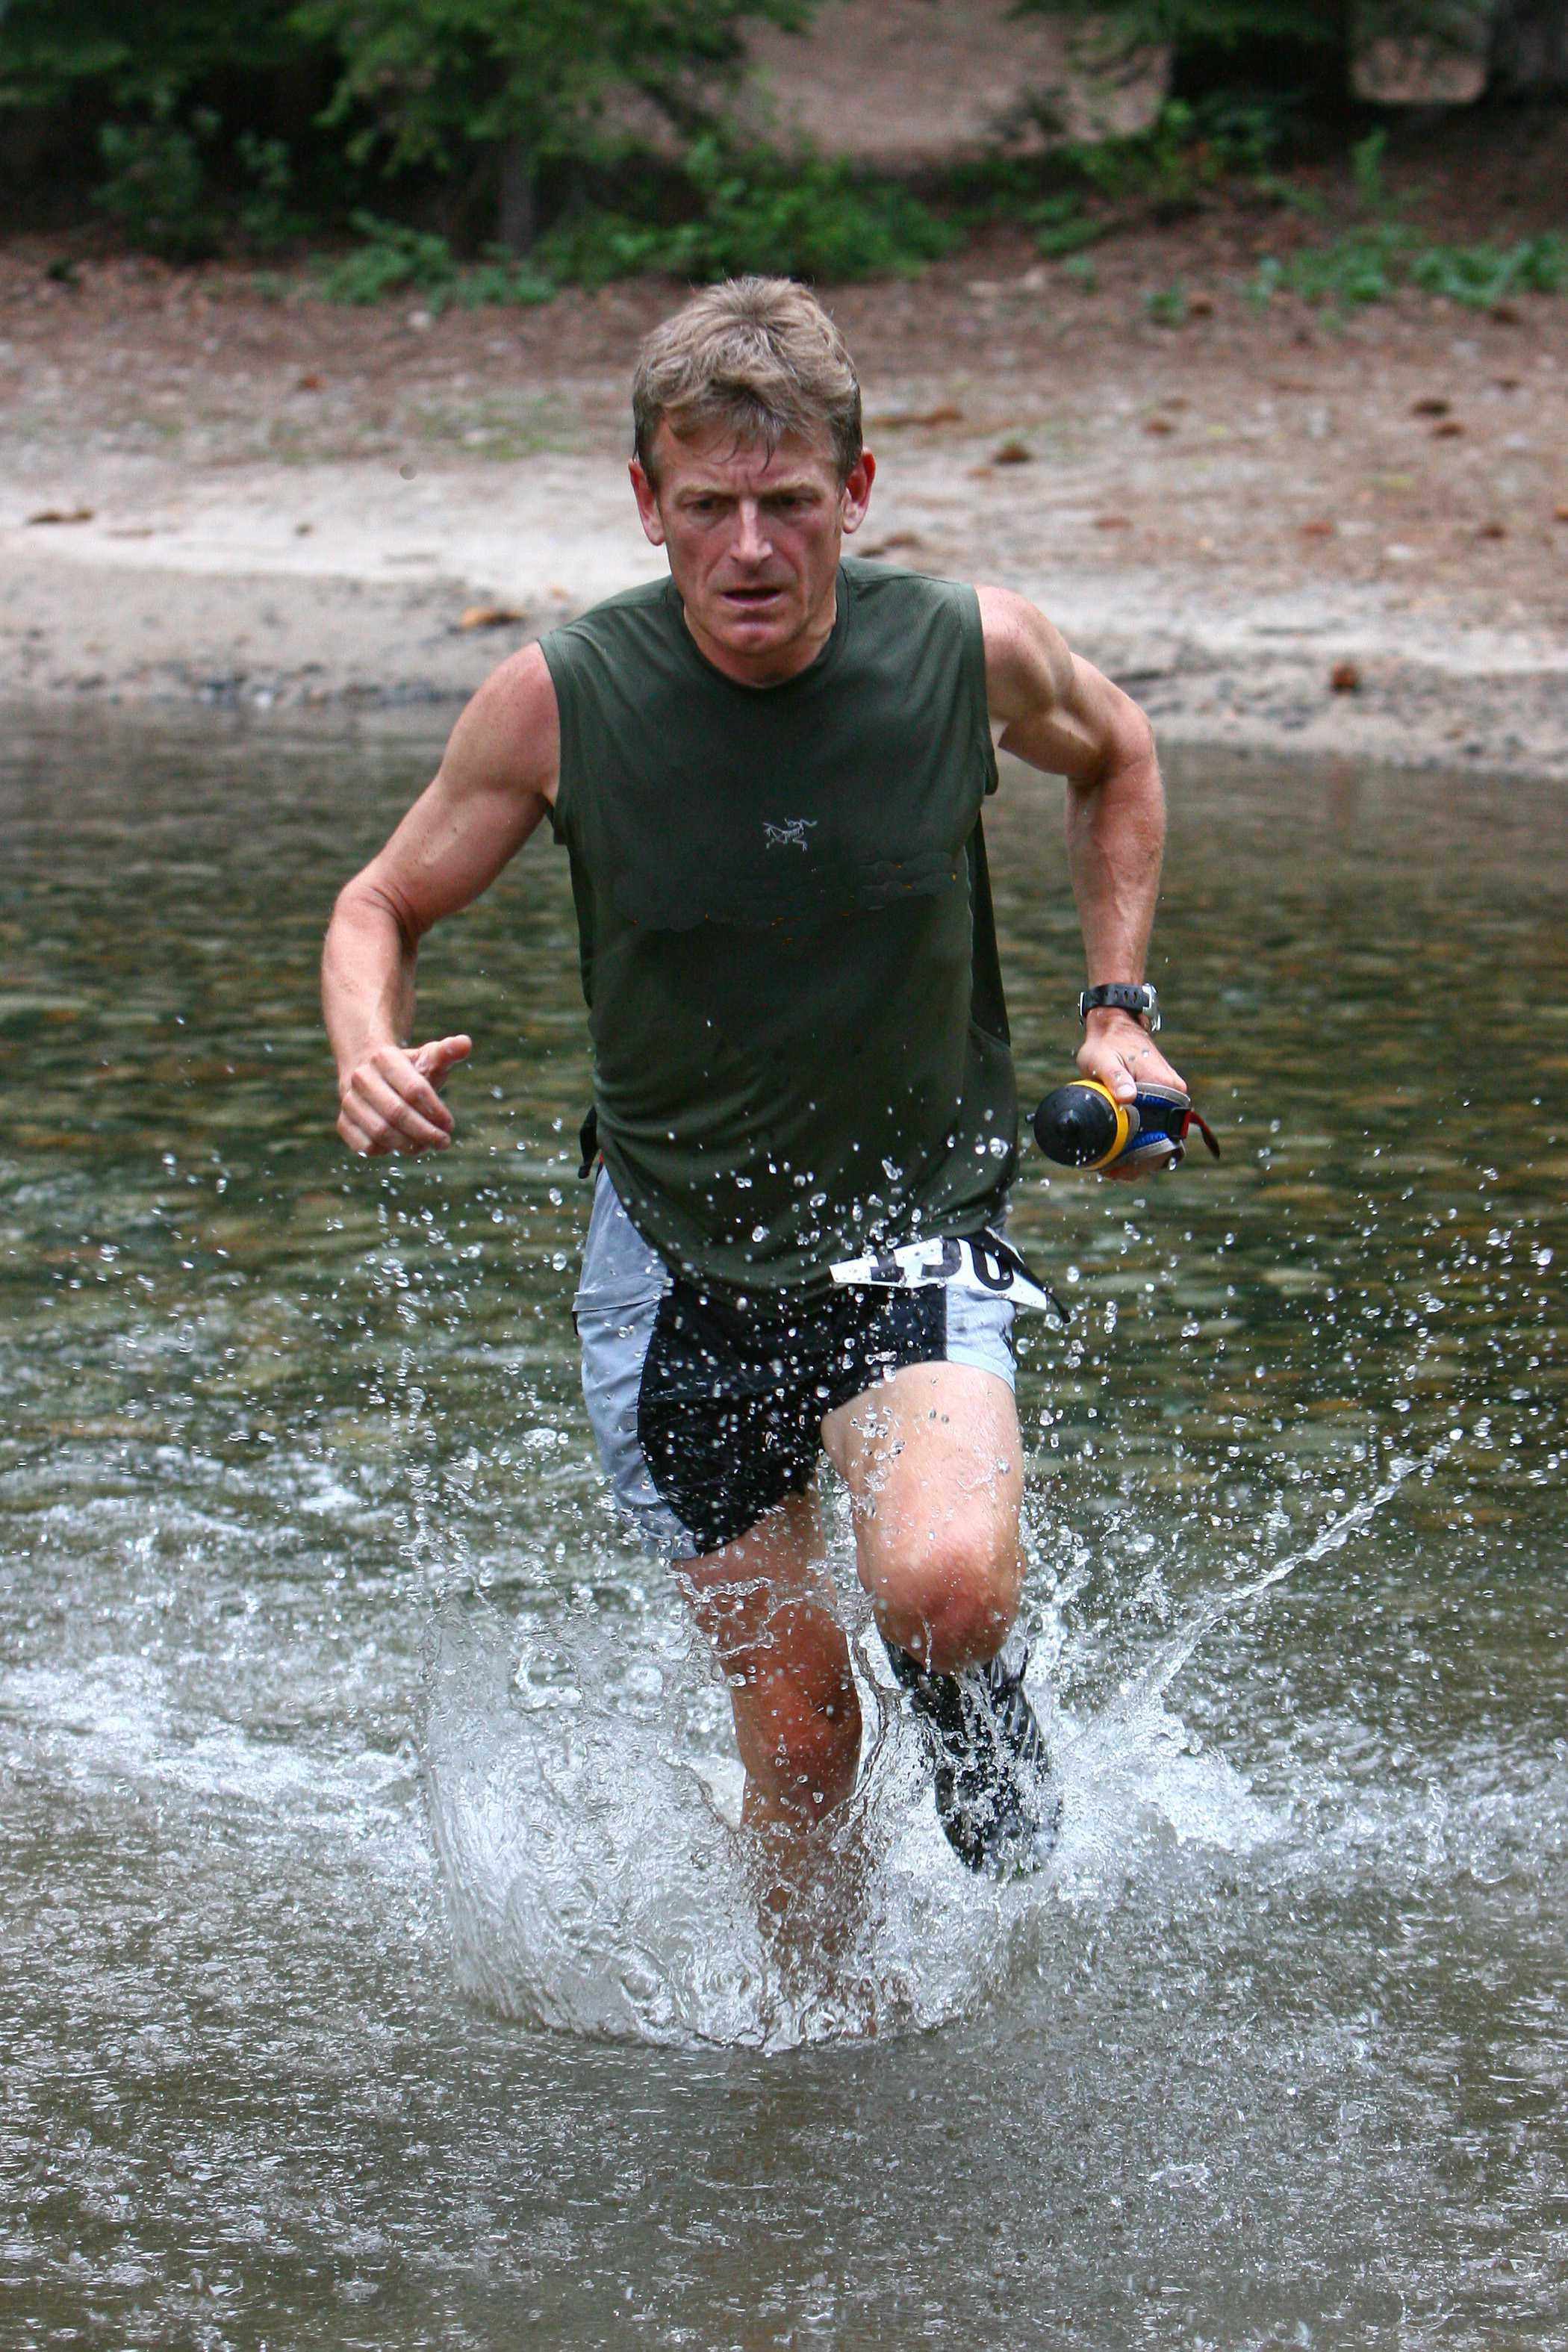 Ultramarathon News Podcasts: Ultramarathon News, Podcasts, And